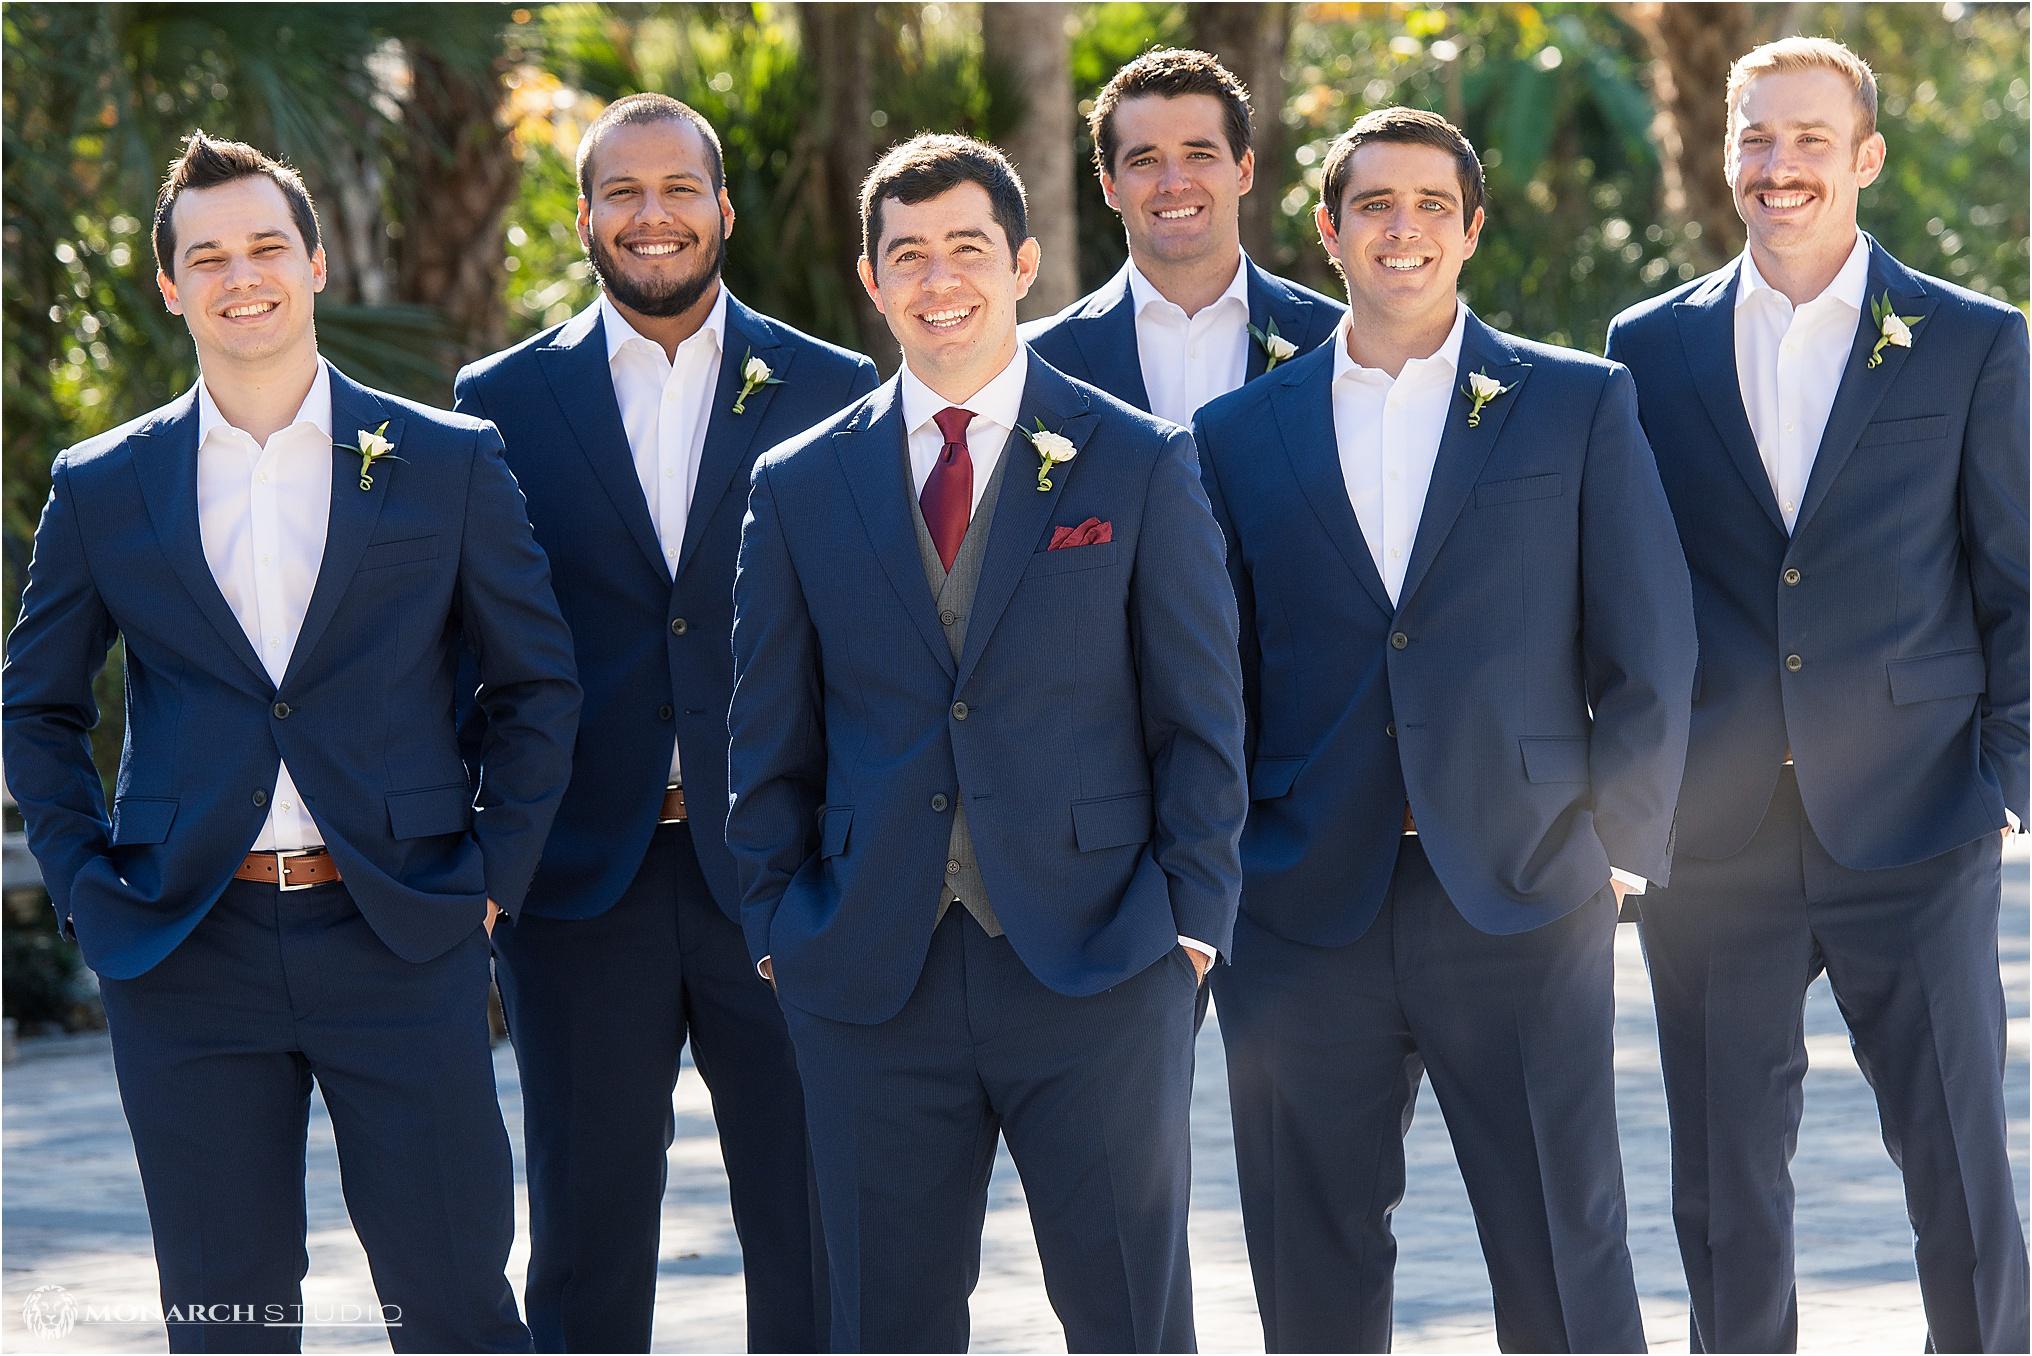 Wedding-photographer-in-sanford-florida-natural-wedding-007.jpg